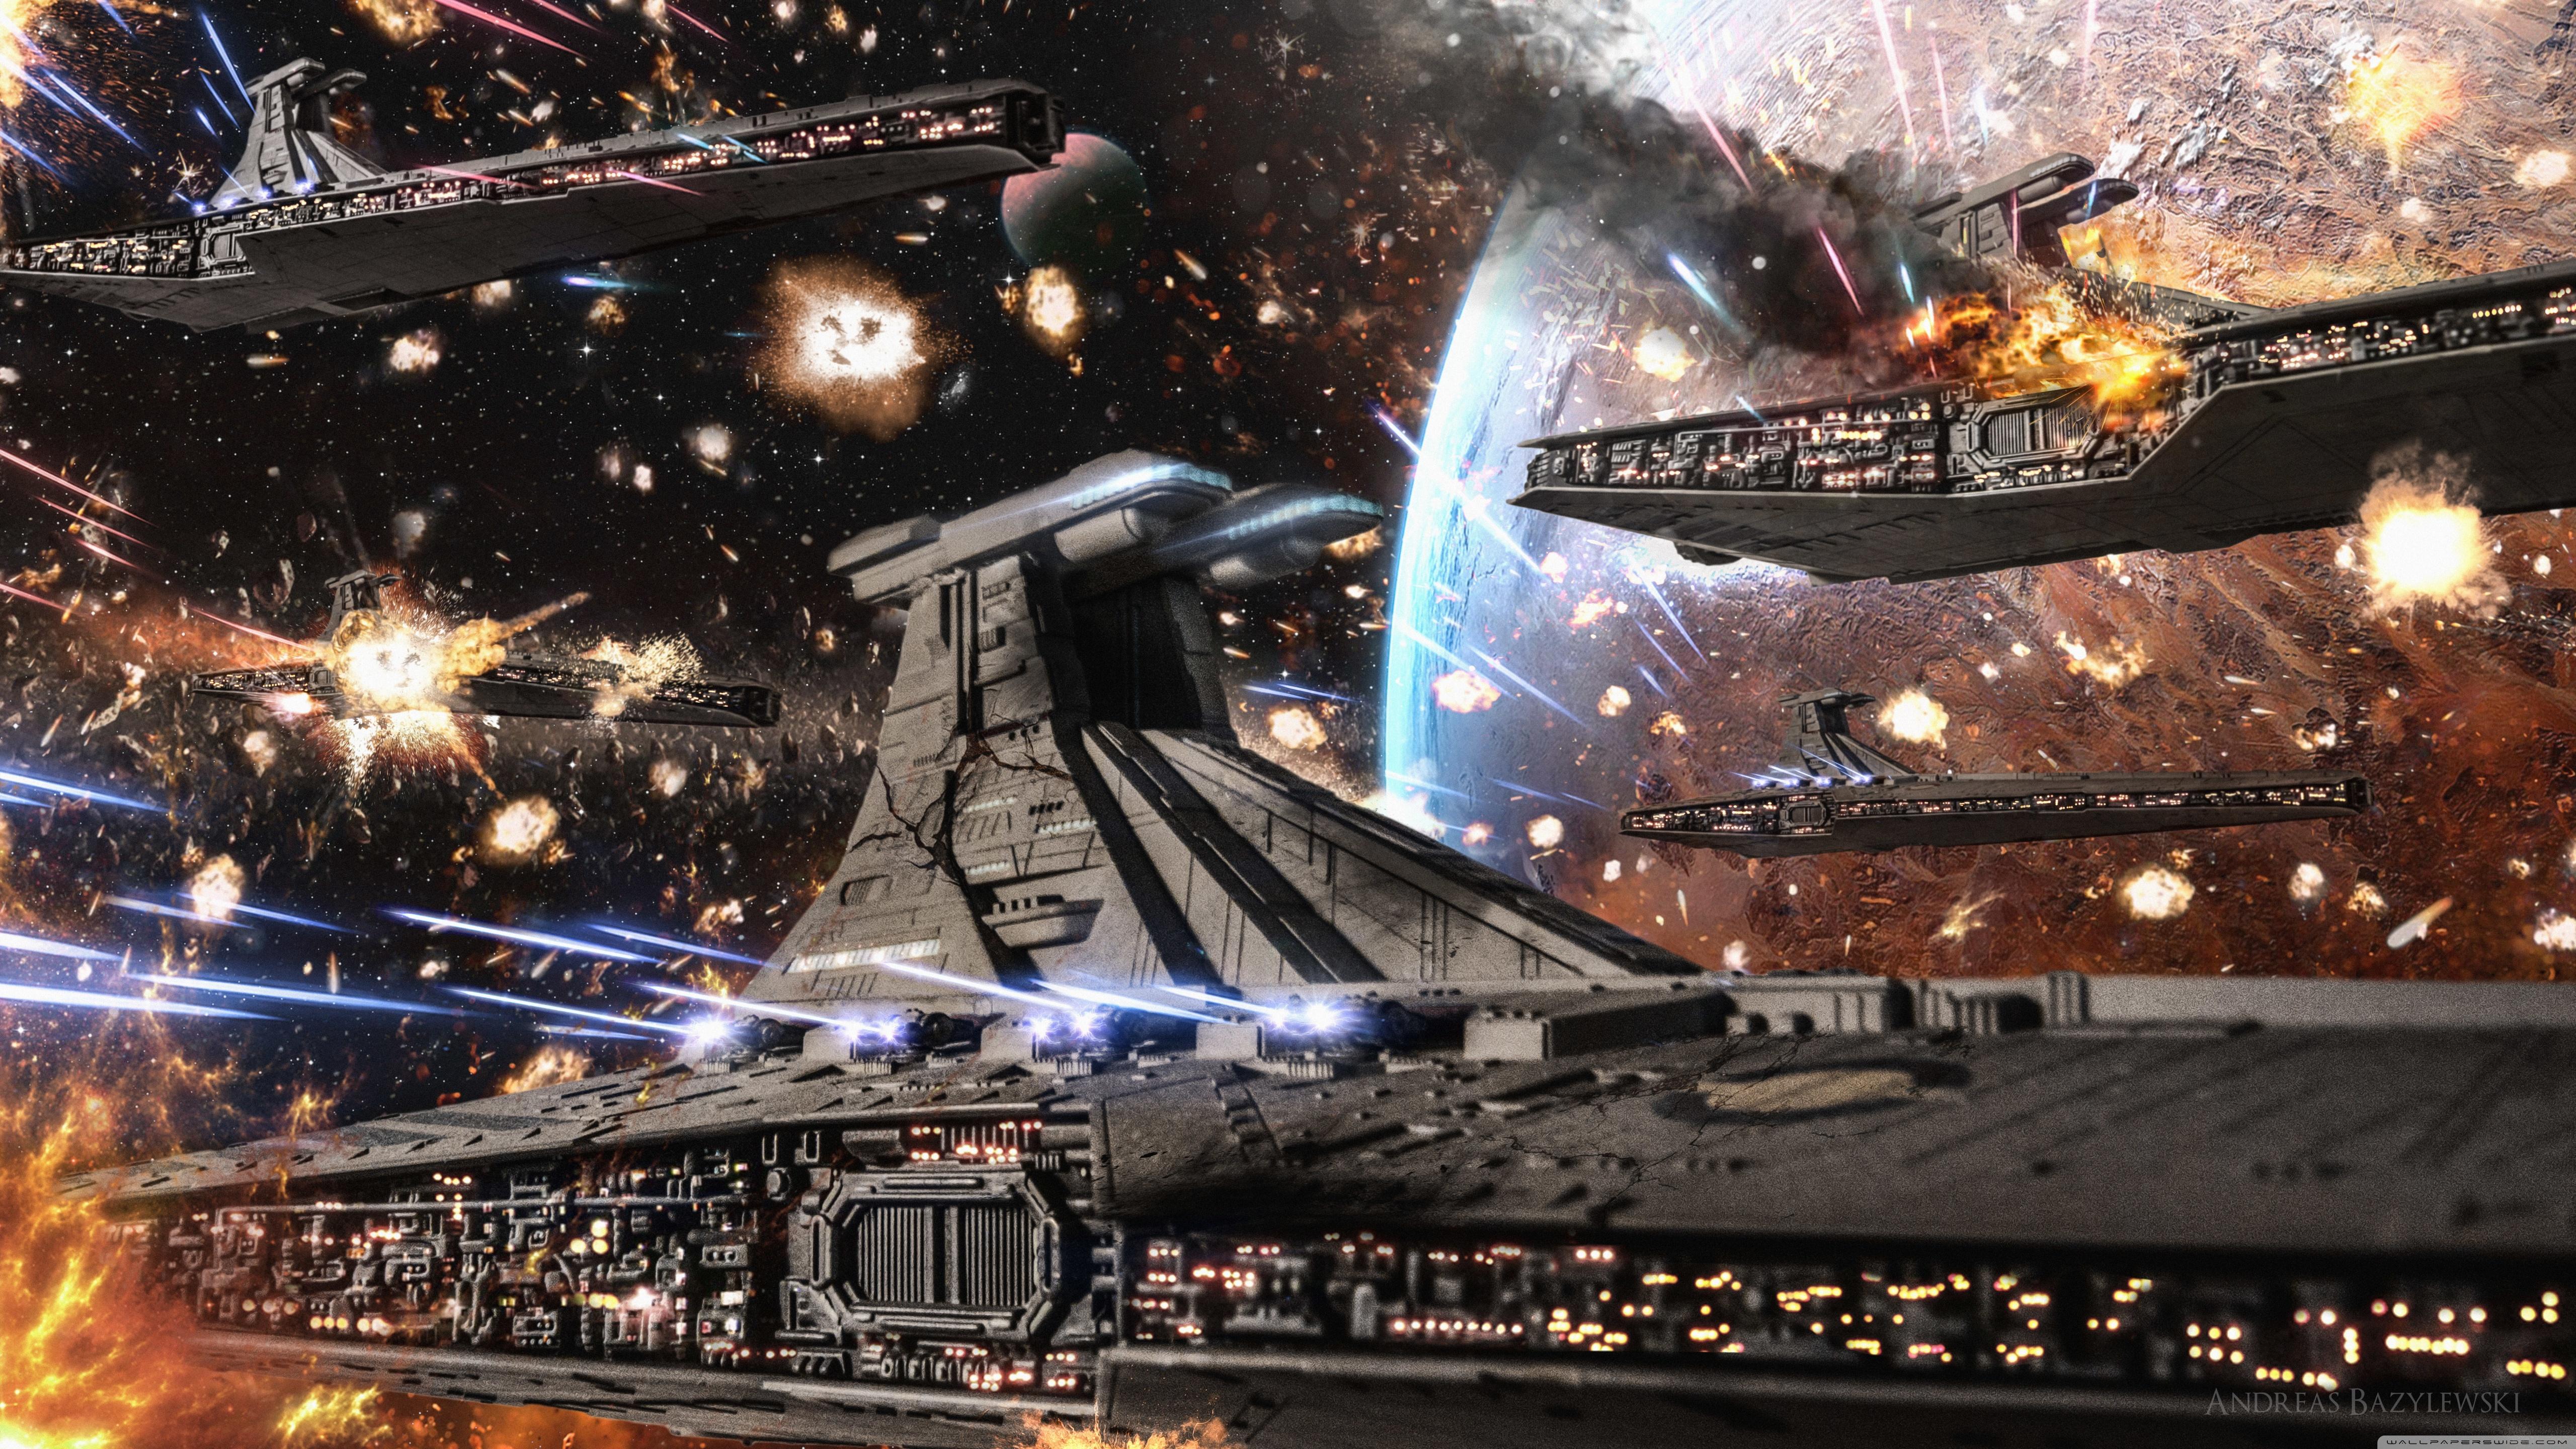 Free Download Star Wars Clone Wars Republic Venator Fleet 4k Hd Desktop 5120x2880 For Your Desktop Mobile Tablet Explore 56 Star Wars Clone Wars Space Background Star Wars Clone